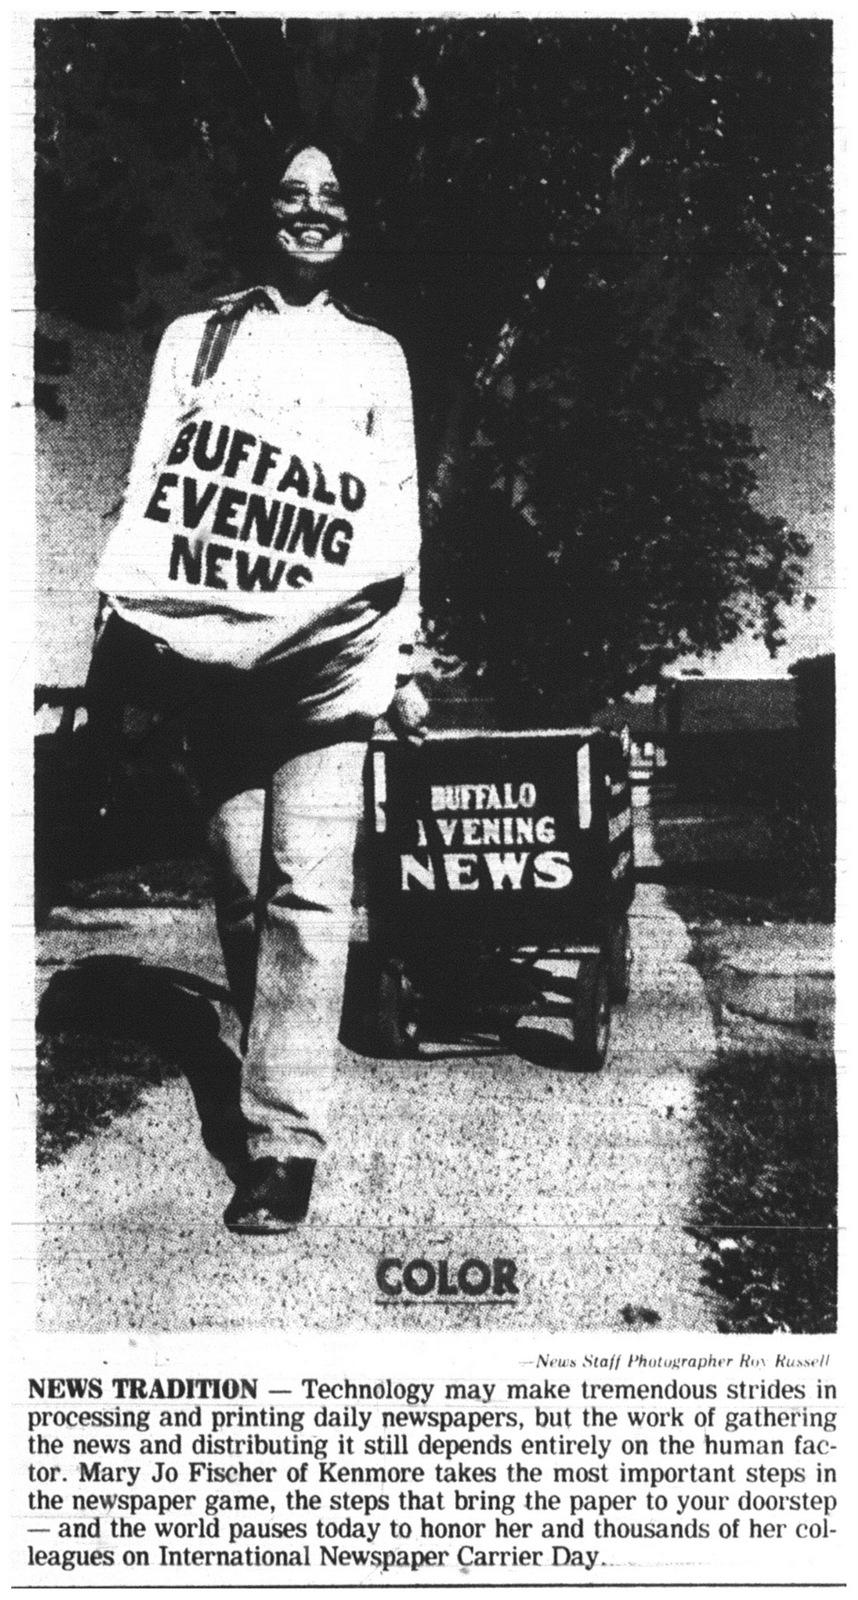 oct  13  1979  the big blue buffalo evening news wagon